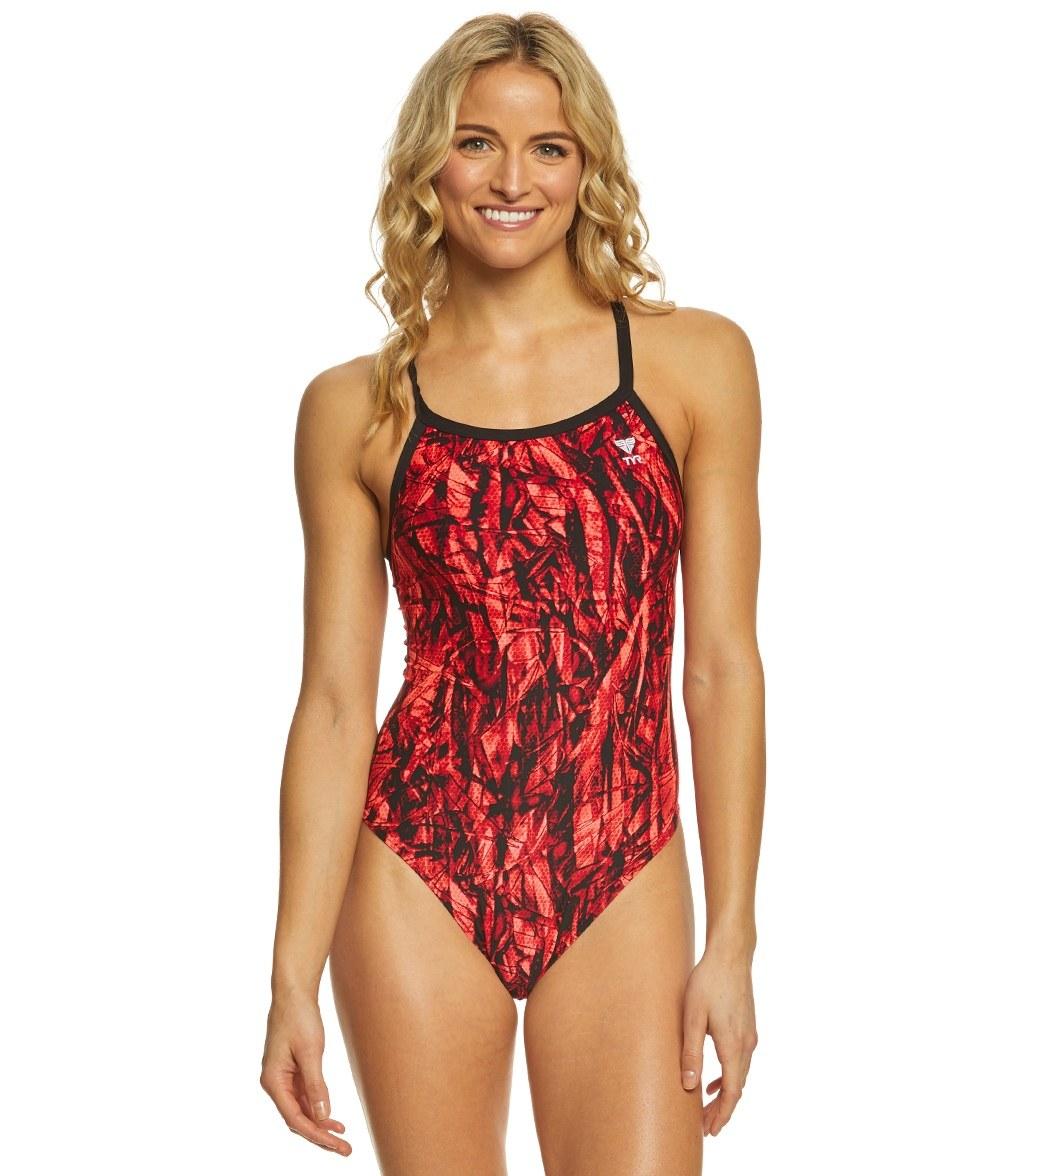 fa796dac4953 TYR Women s Sagano Diamondfit One Piece Swimsuit at SwimOutlet.com - Free  Shipping